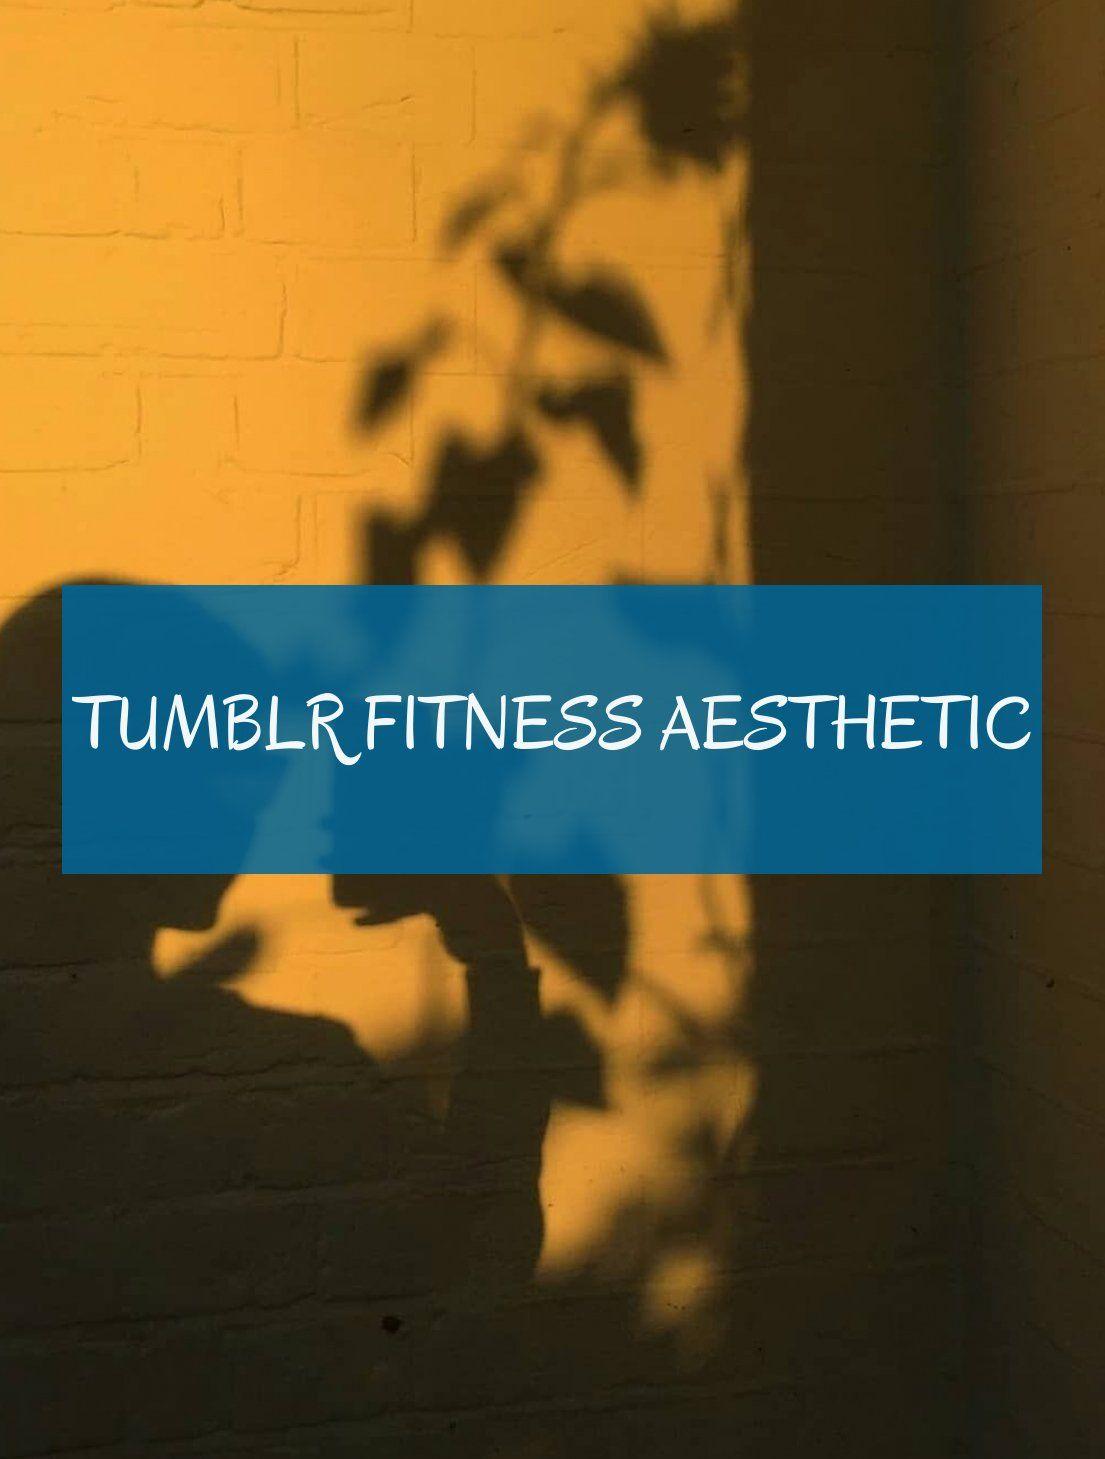 Tumblr Fitness aesthetic #Tumblr #Fitness #aesthetic